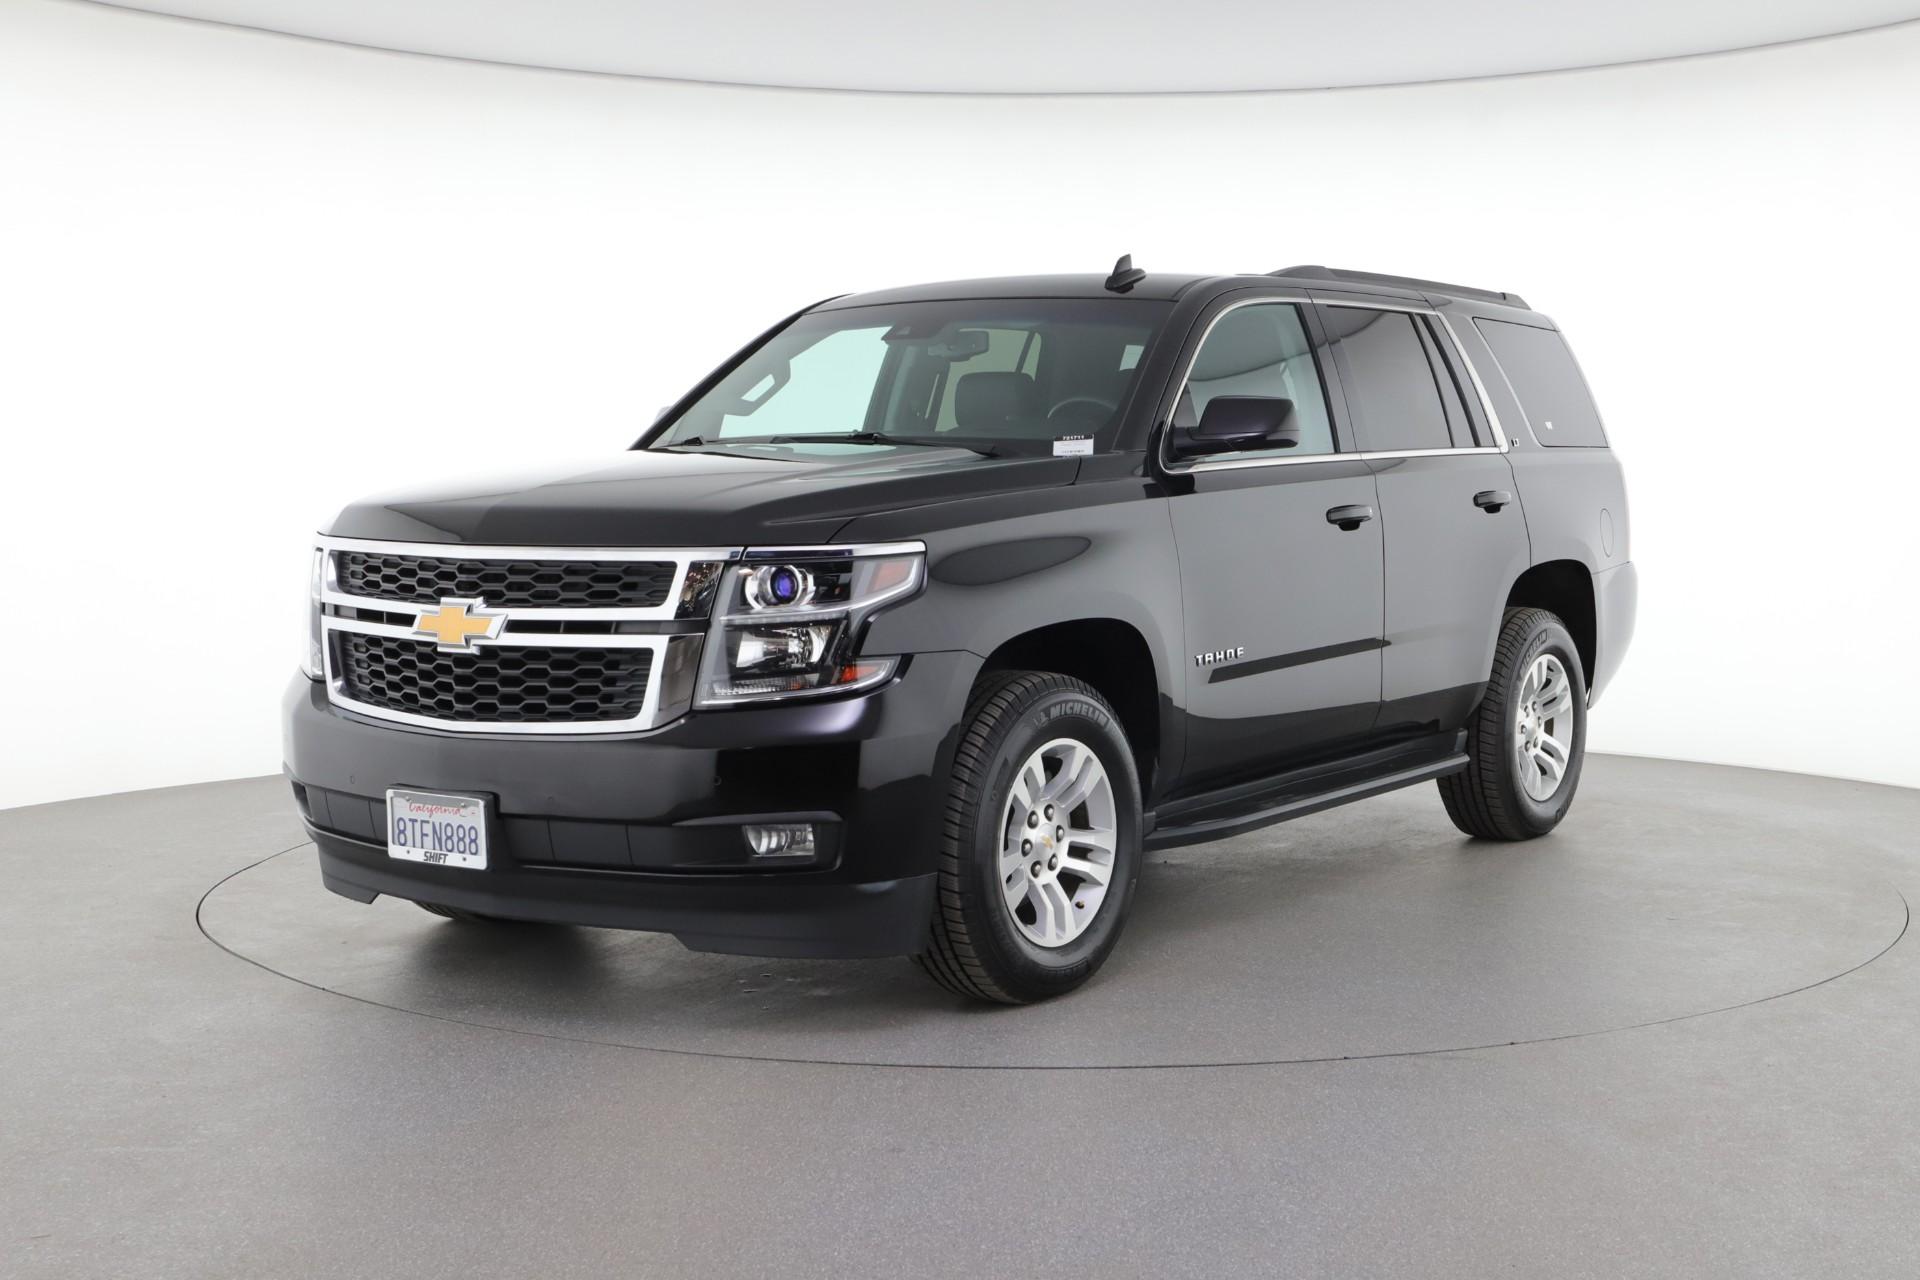 2015 Chevrolet Tahoe LT (from $33,950)